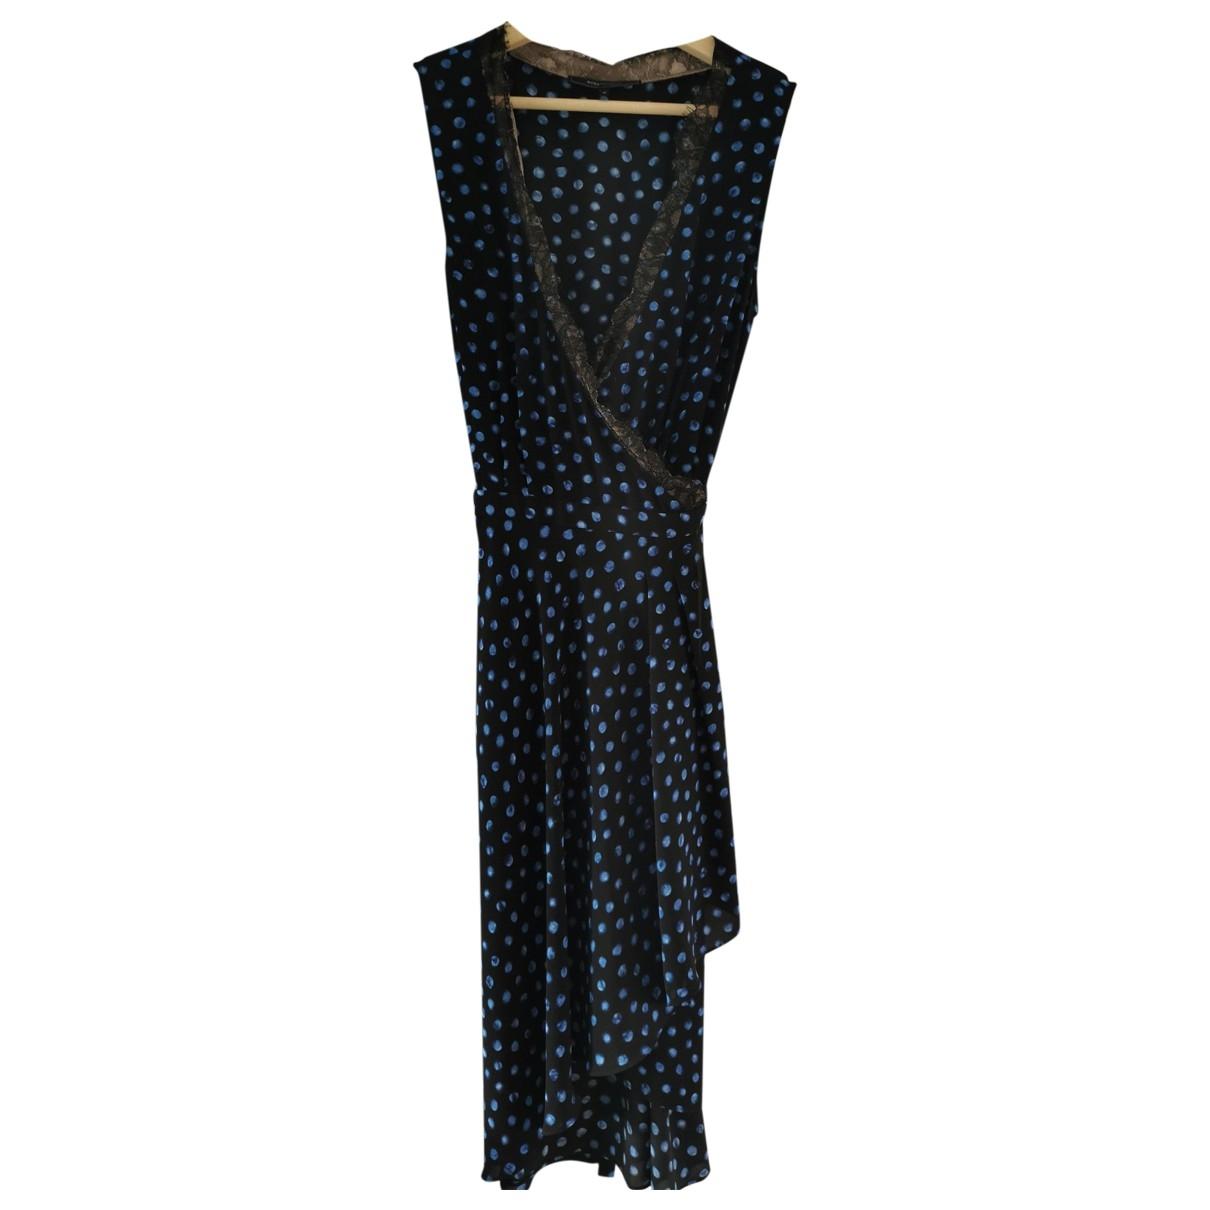 Bcbg Max Azria \N Black dress for Women 38 FR